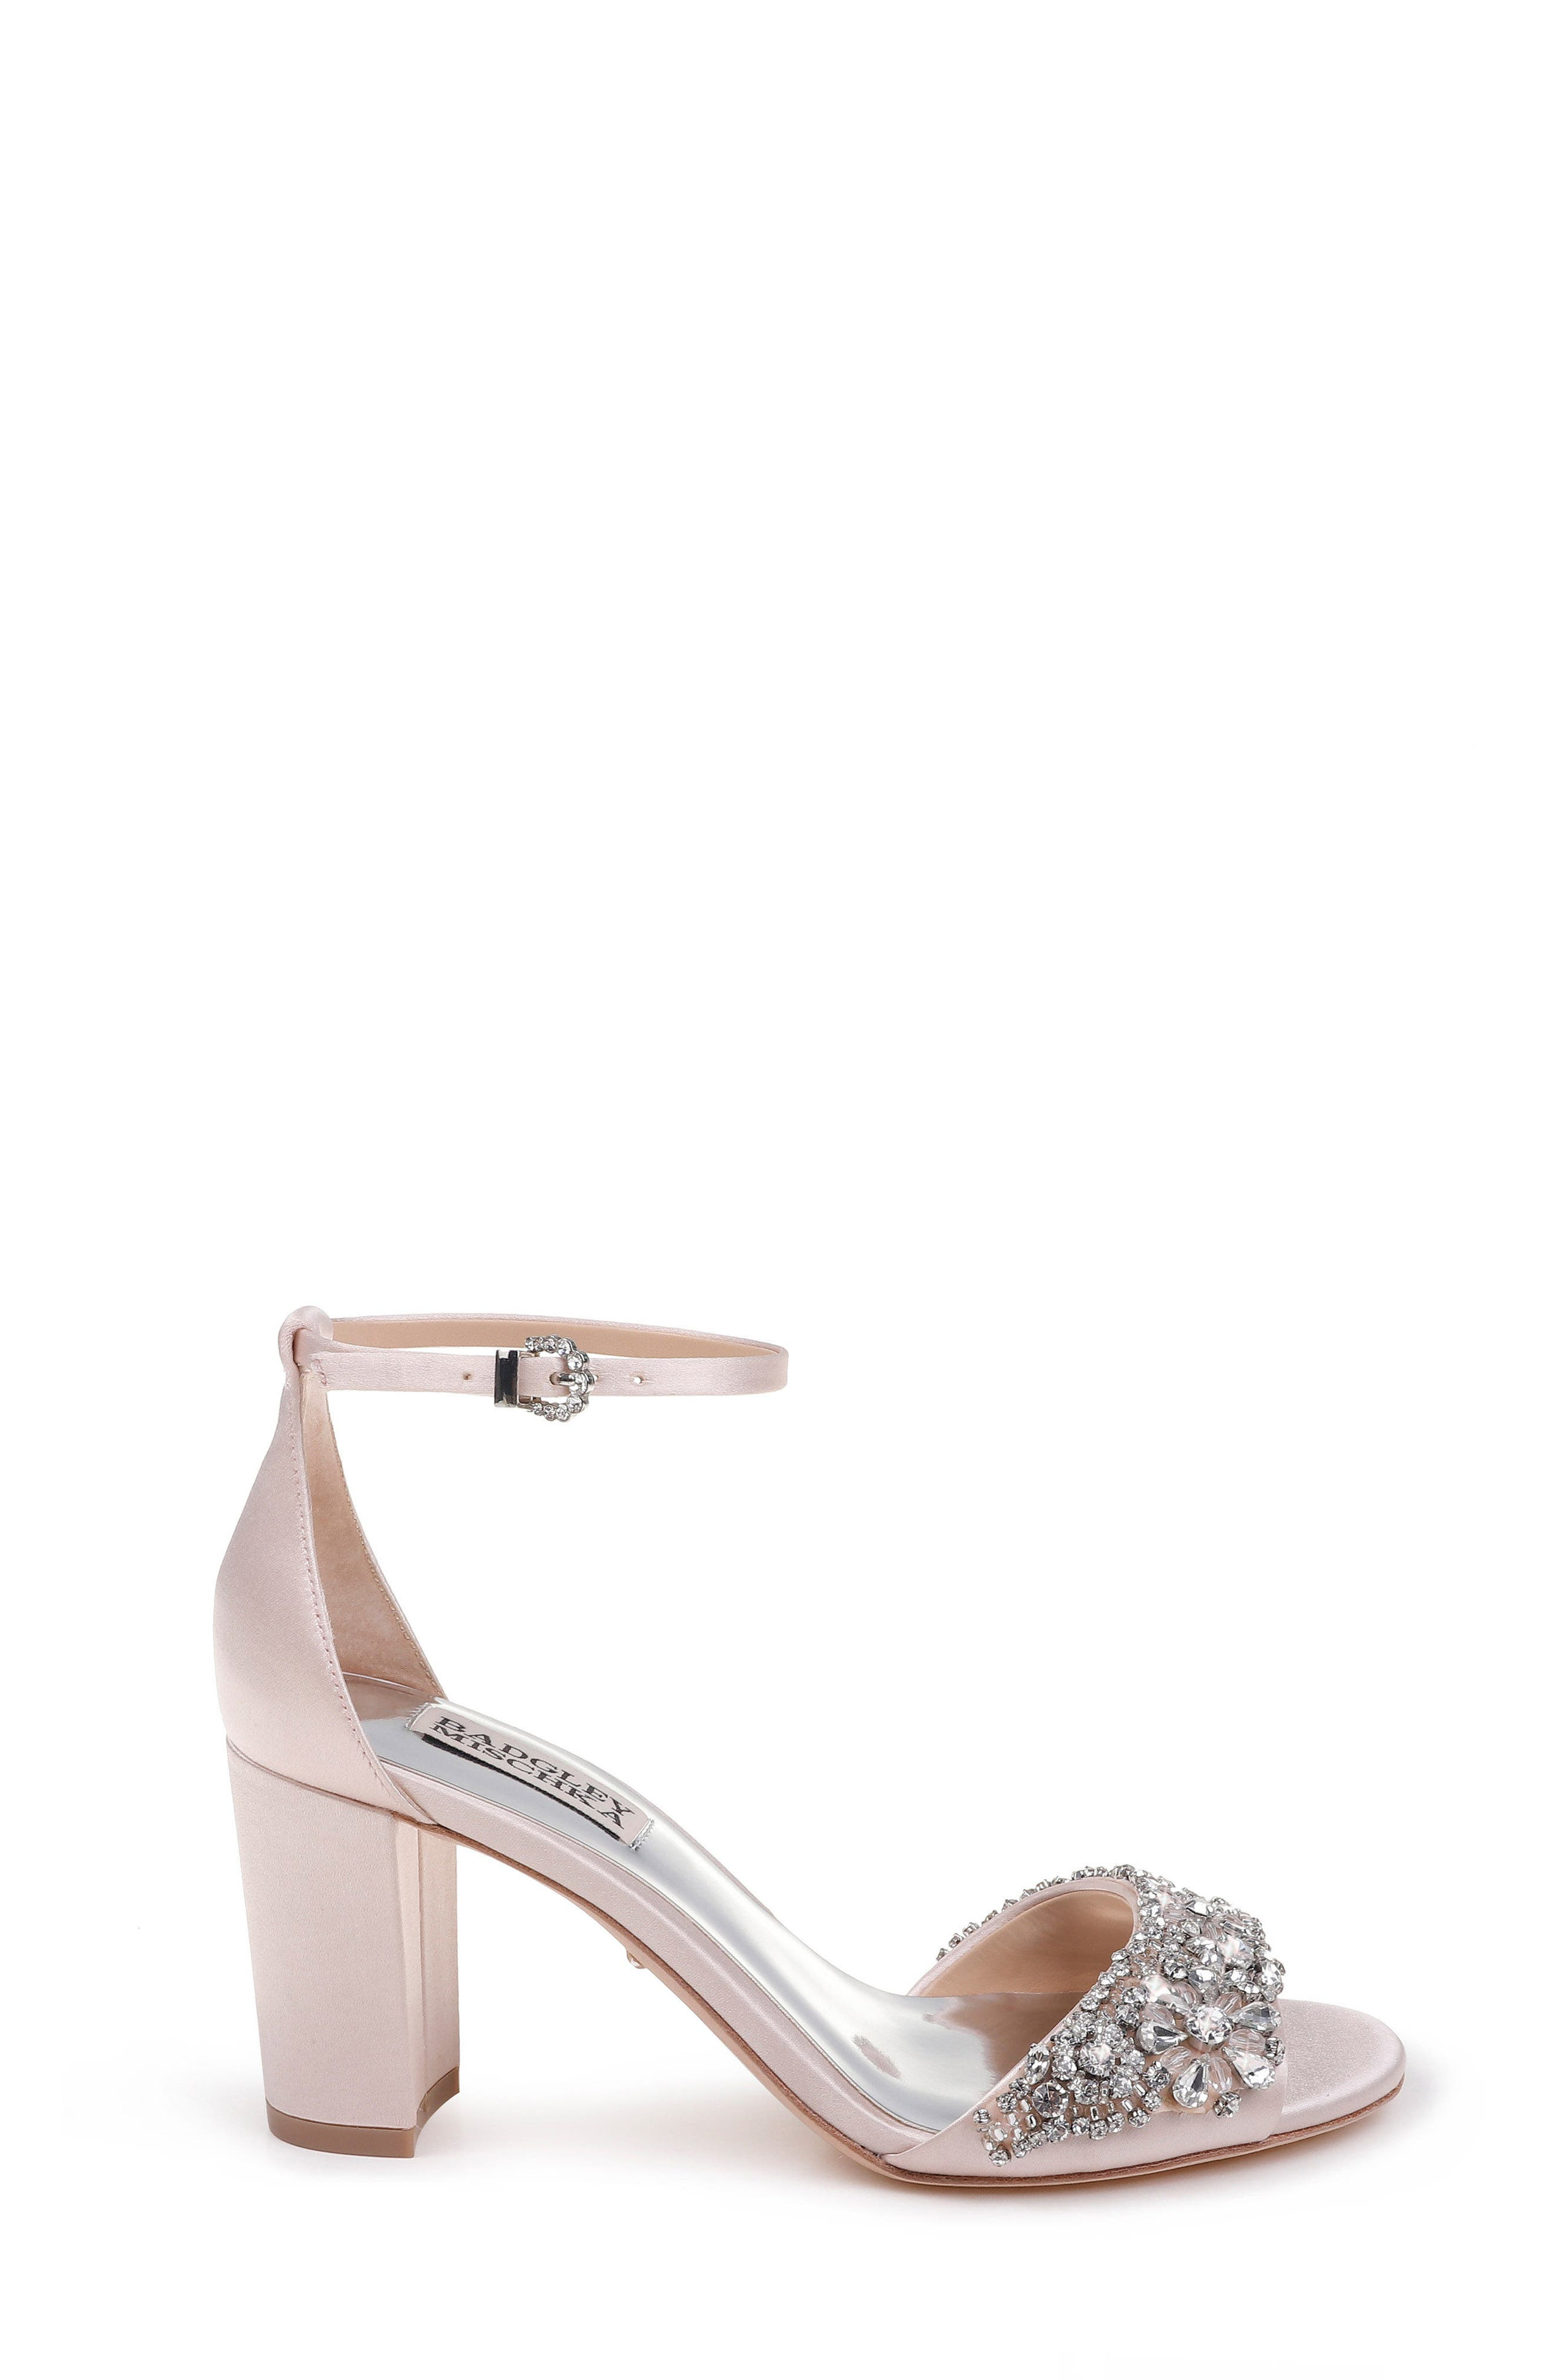 Hines Embellished Block Heel Sandal,                             Alternate thumbnail 15, color,